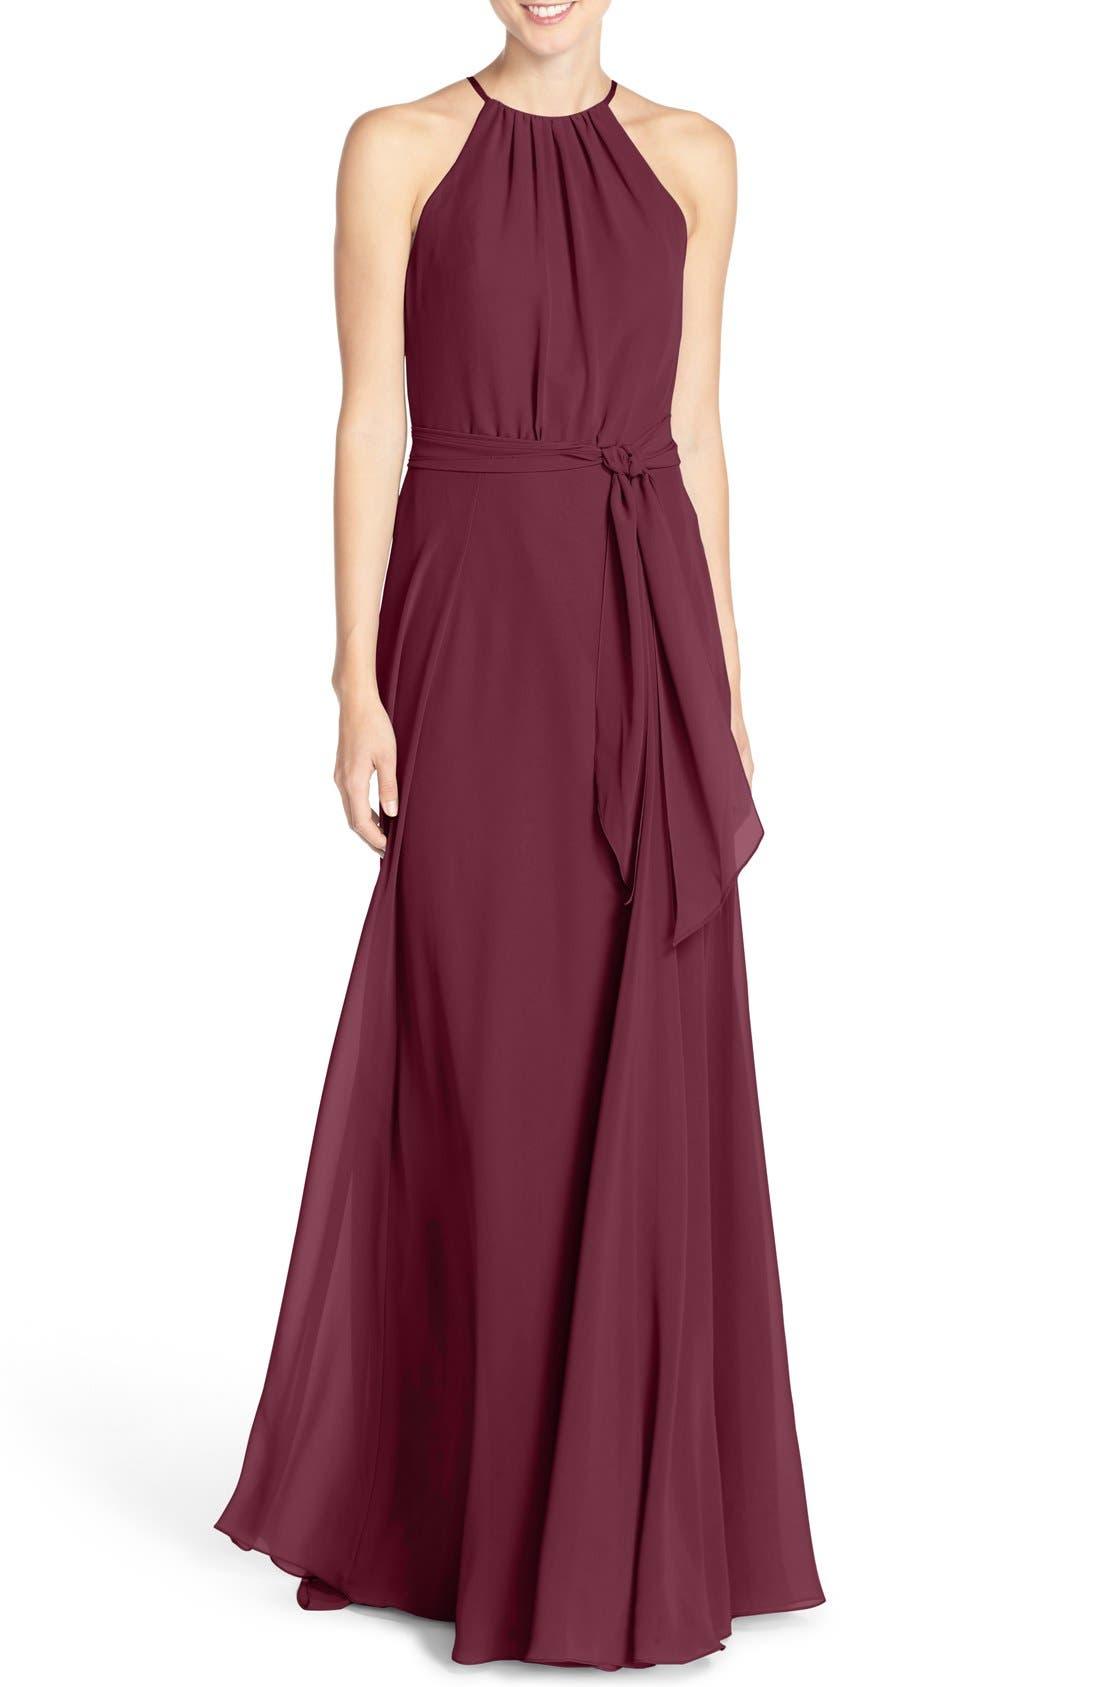 'Delaney' Belted A-Line Chiffon Halter Dress,                             Main thumbnail 3, color,